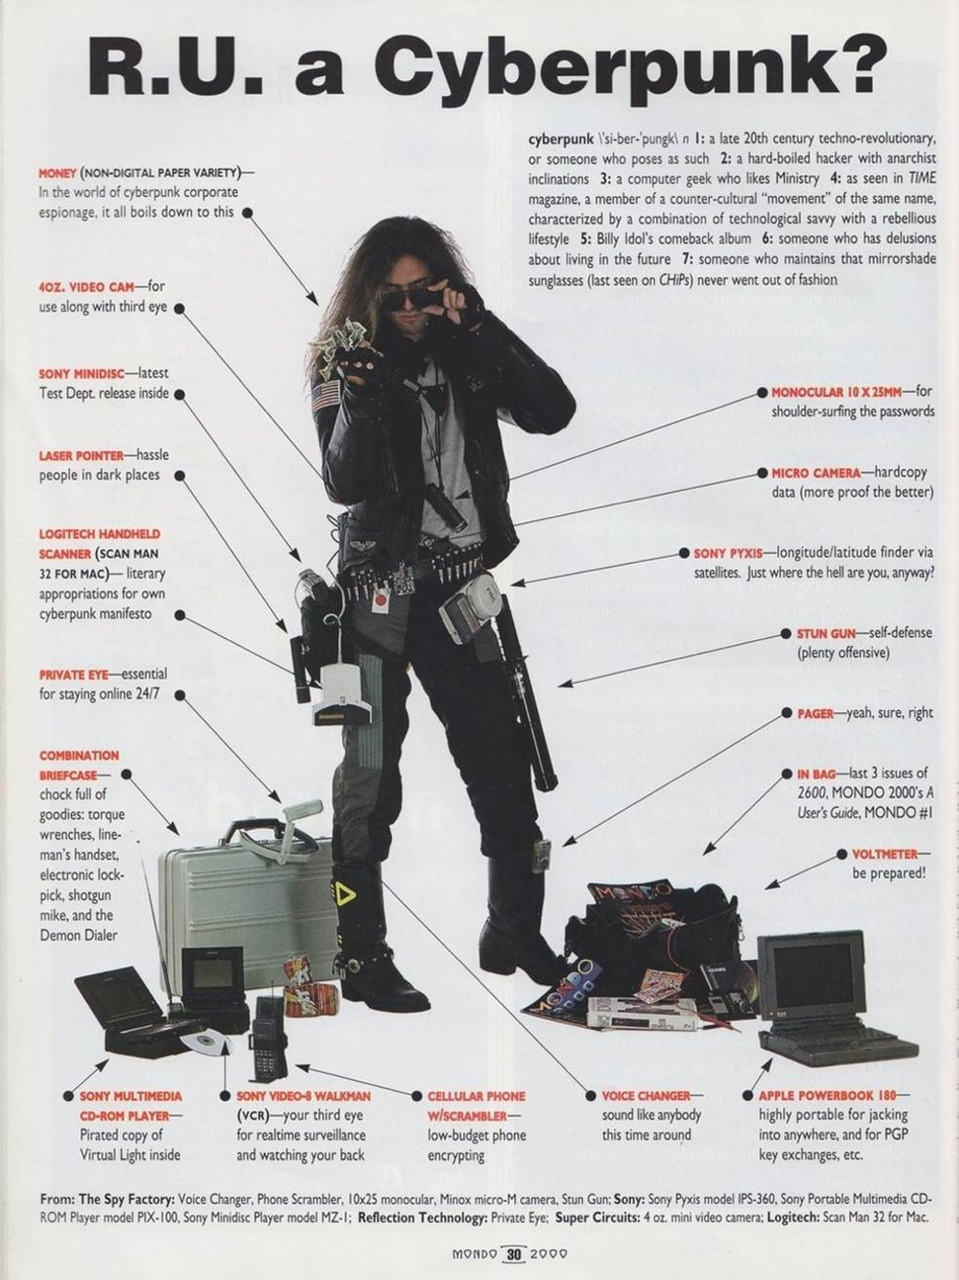 sfadj :     R.U. a Cyberpunk?     Yes.